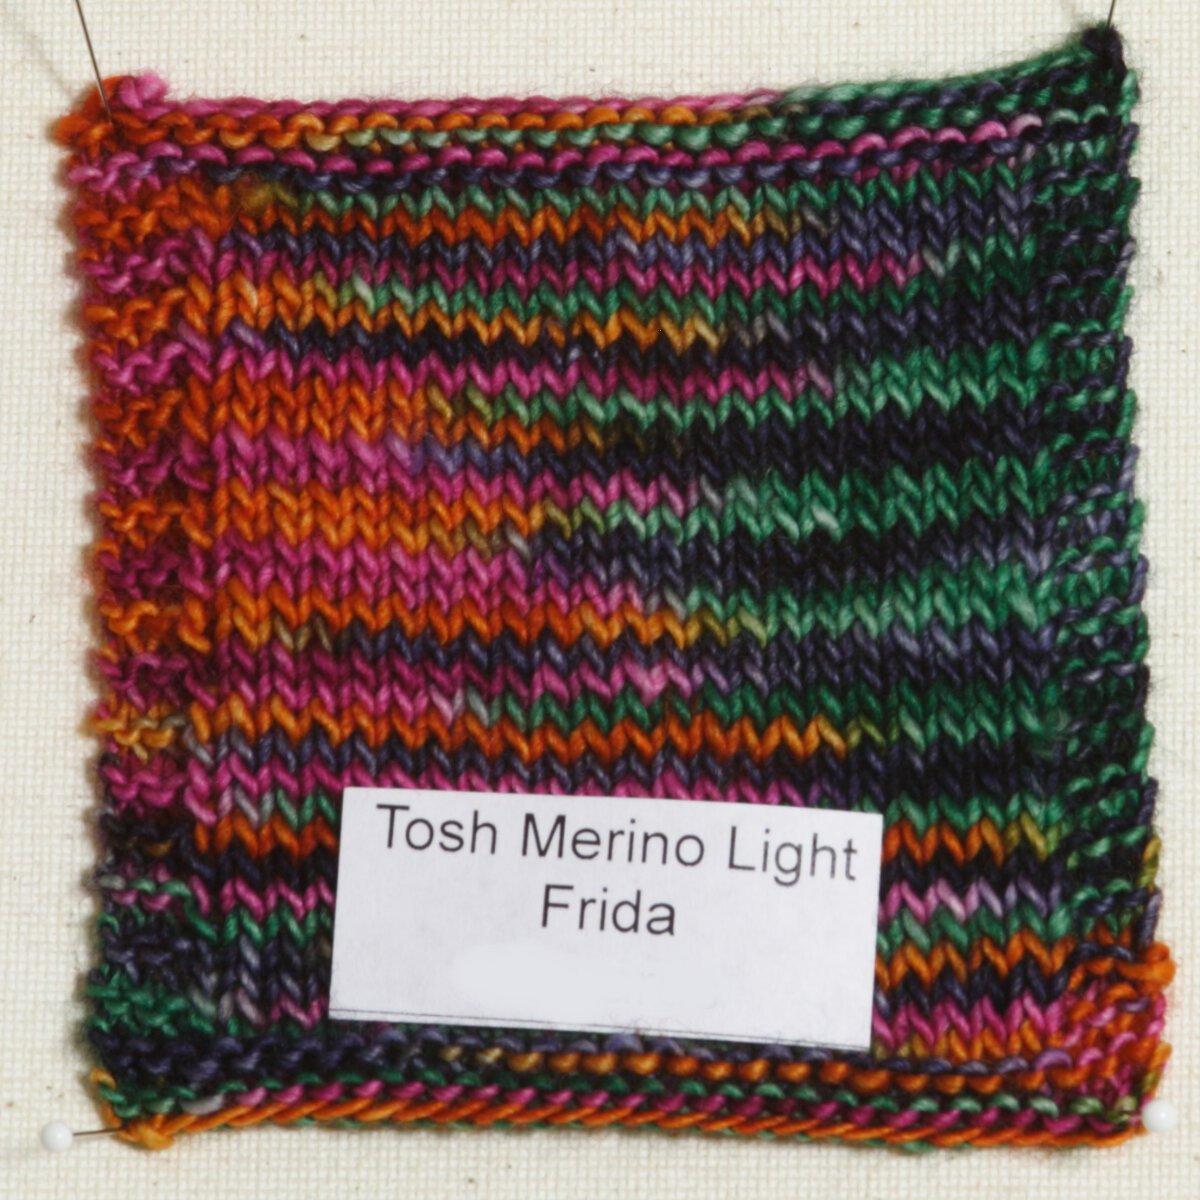 madelinetosh tosh merino light yarn frida at jimmy beans. Black Bedroom Furniture Sets. Home Design Ideas